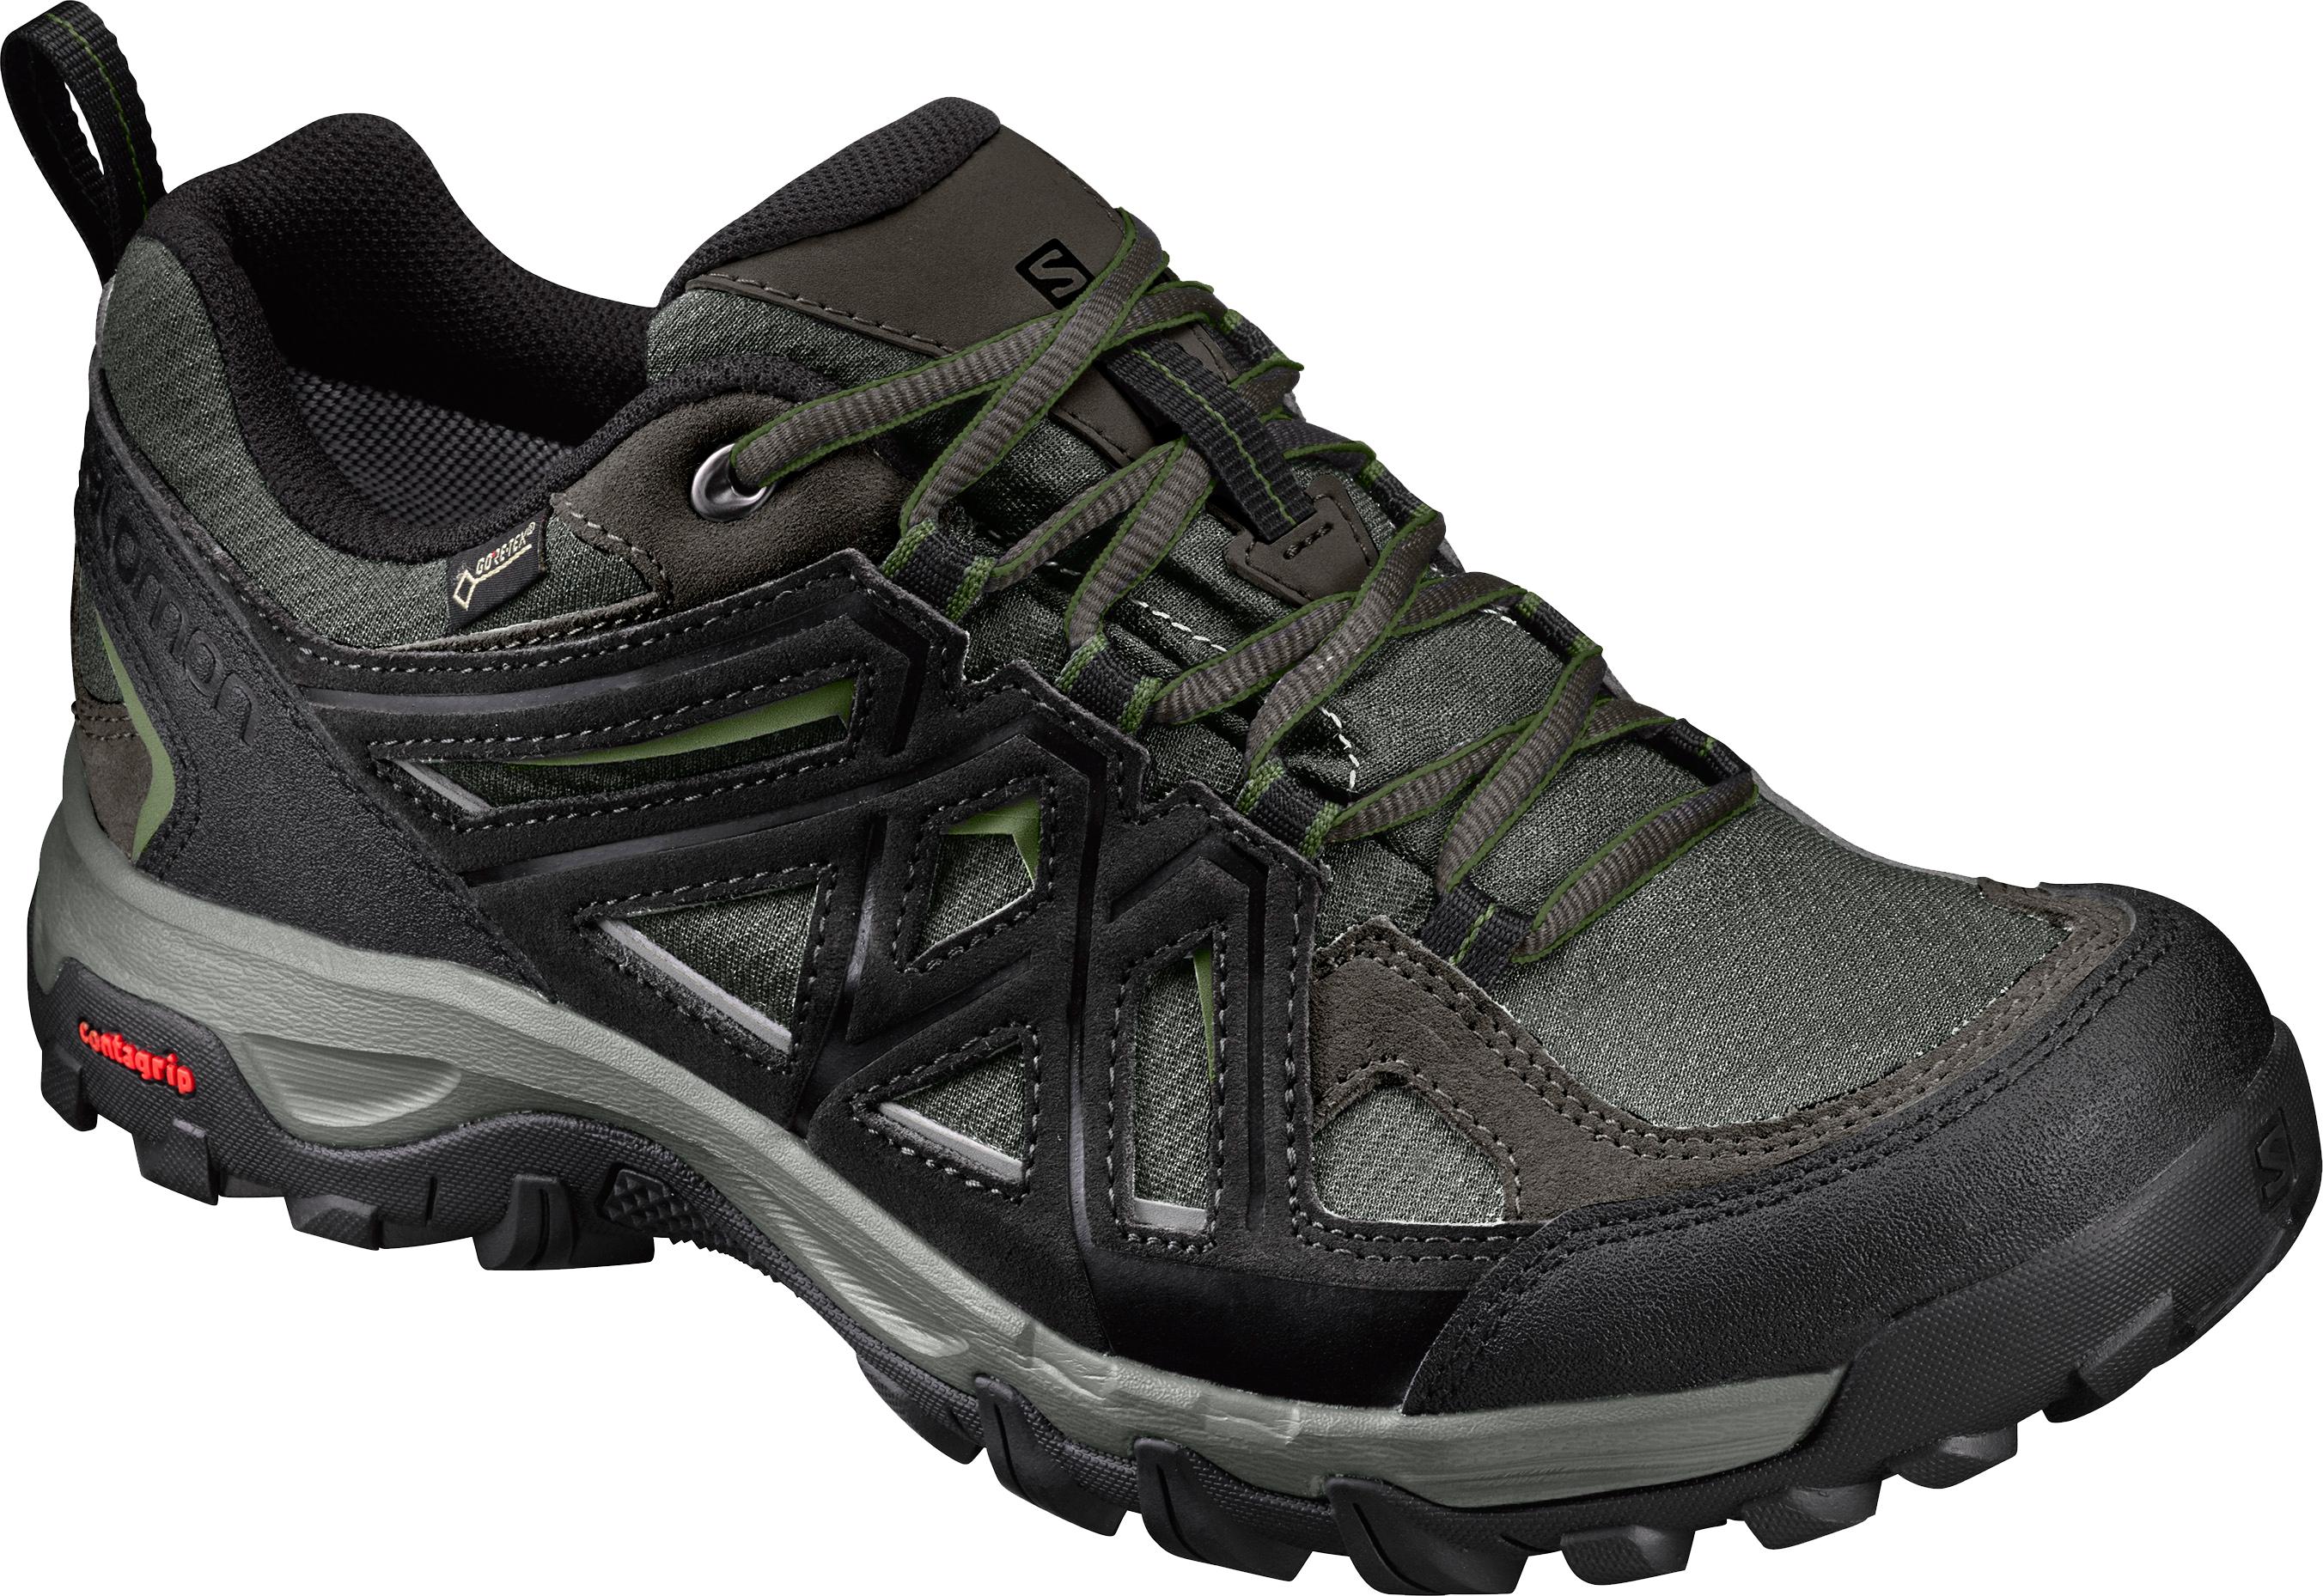 Salomon Men's Evasion 2 Light Gtx Trail Shoes TF1KJlc